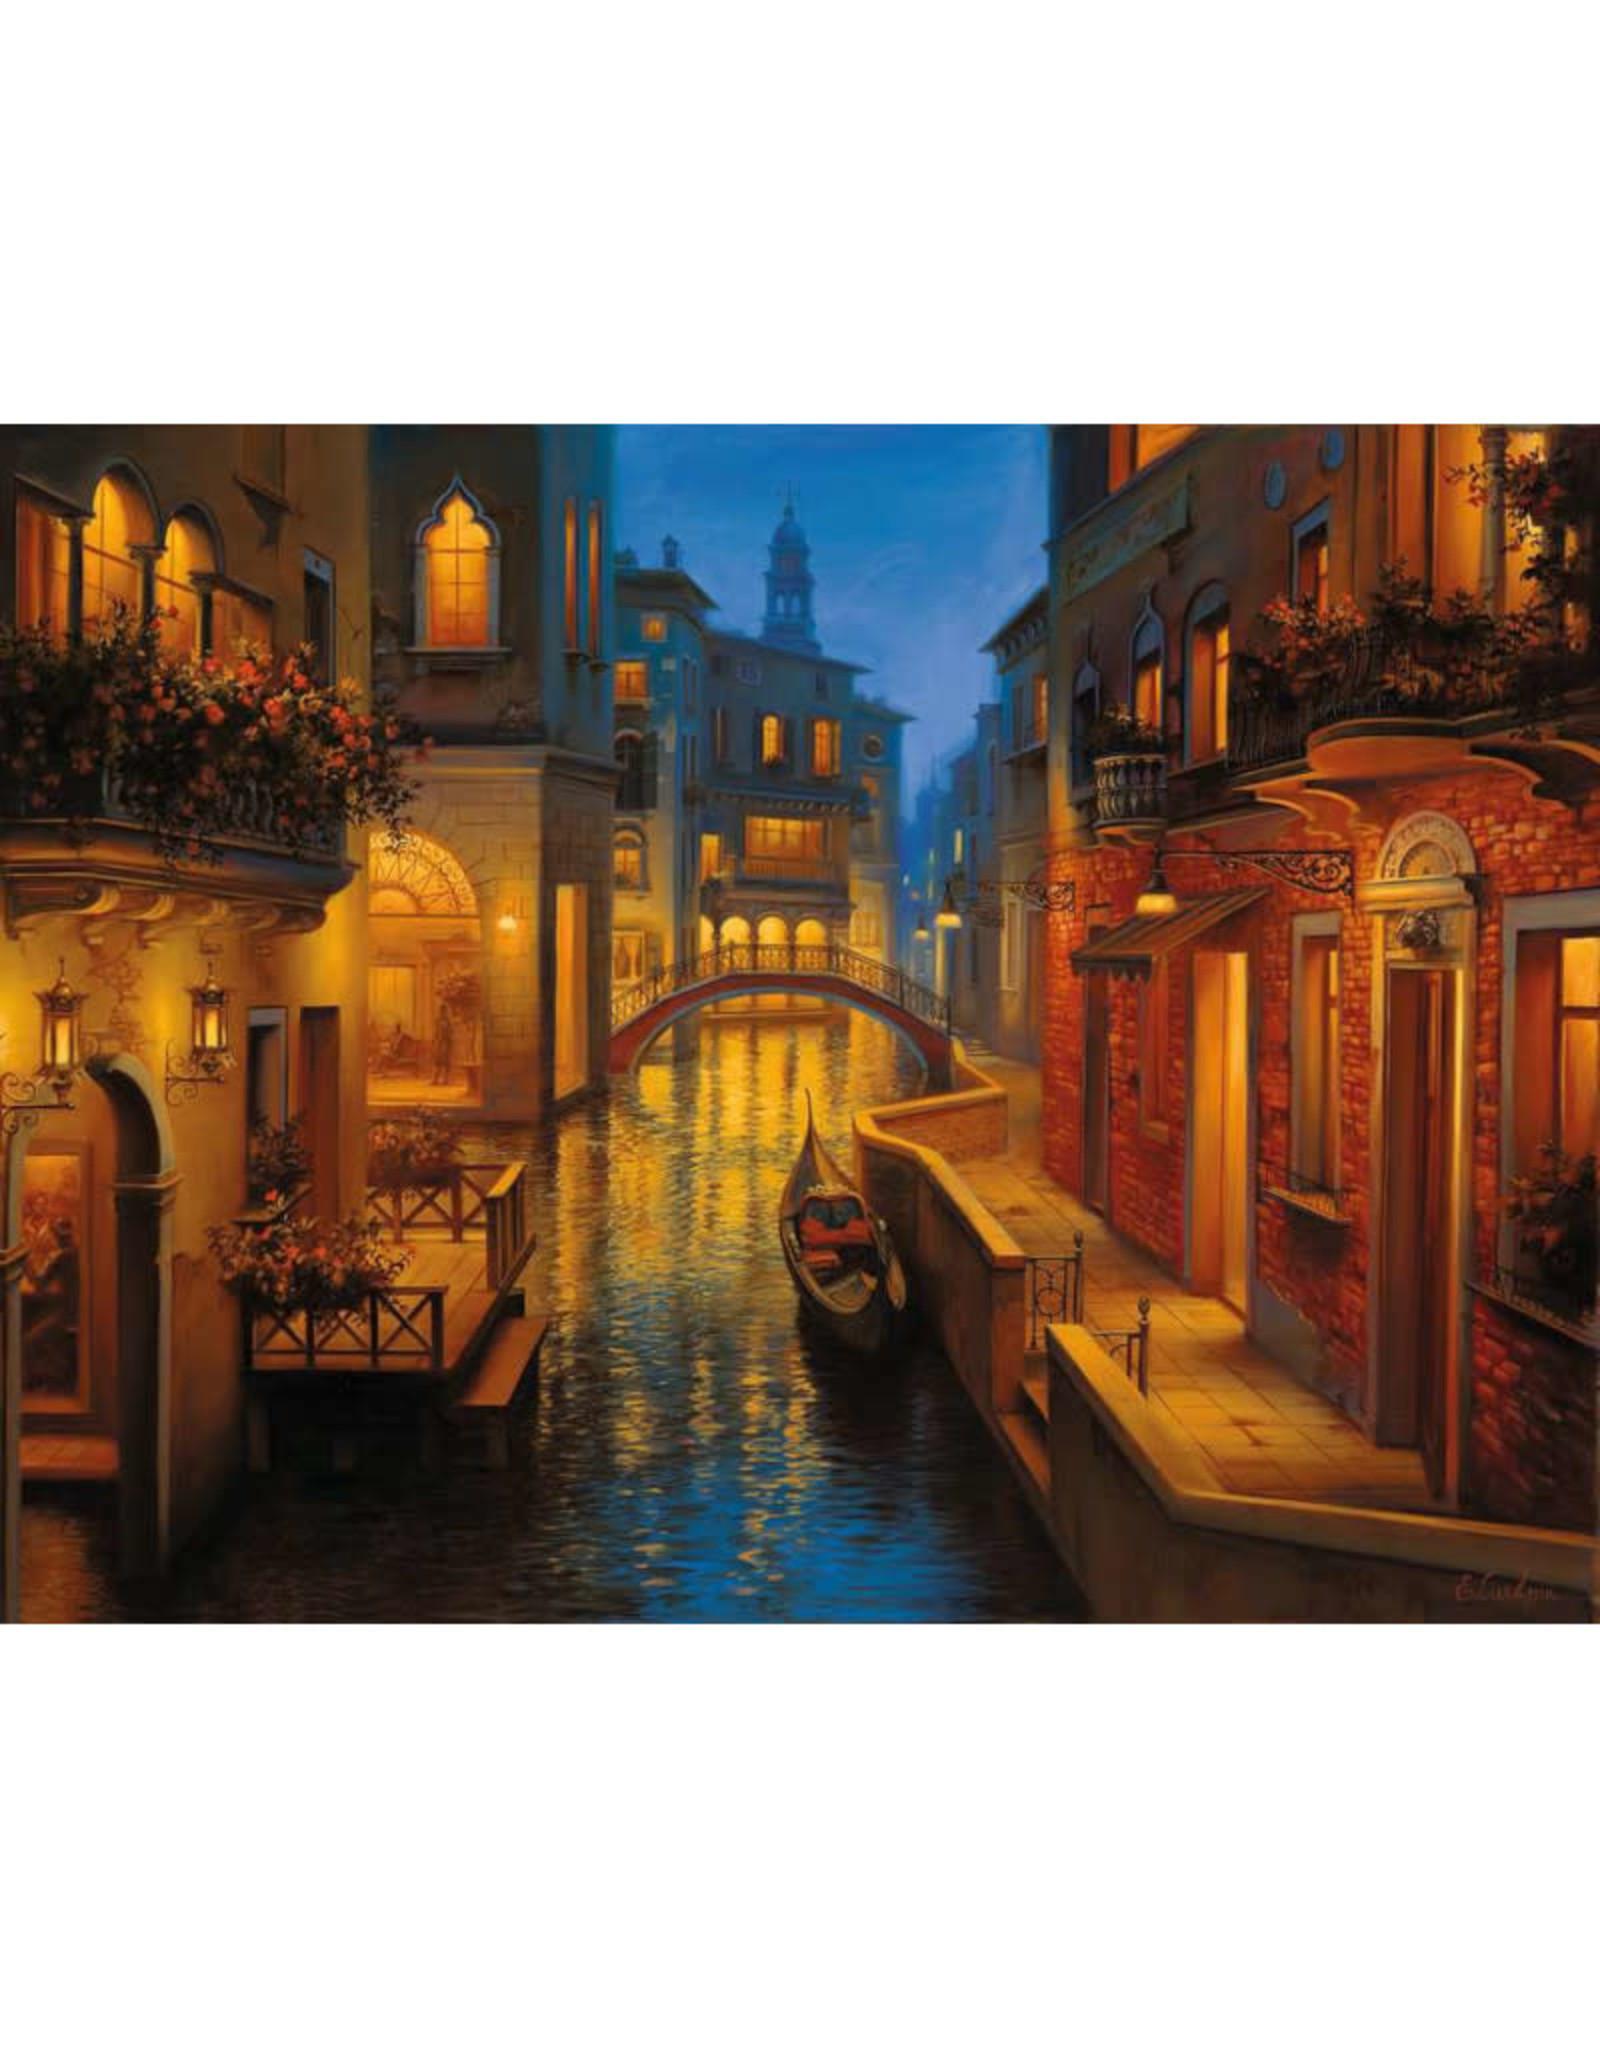 Ravensburger Waters of Venice 1500 PCS